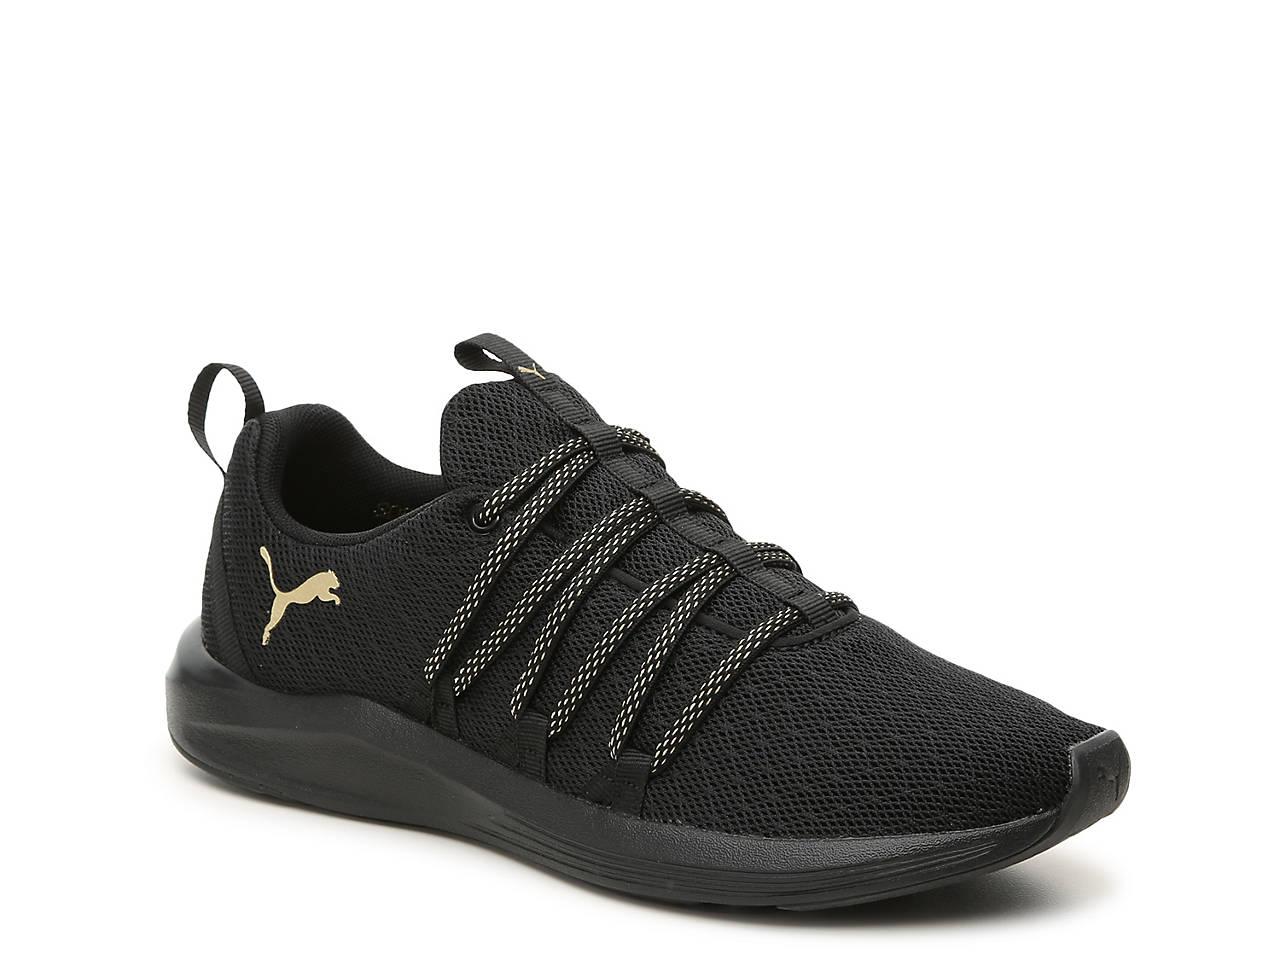 fb5f542121b0f6 Puma Prowl Alt Training Shoe - Women s Women s Shoes